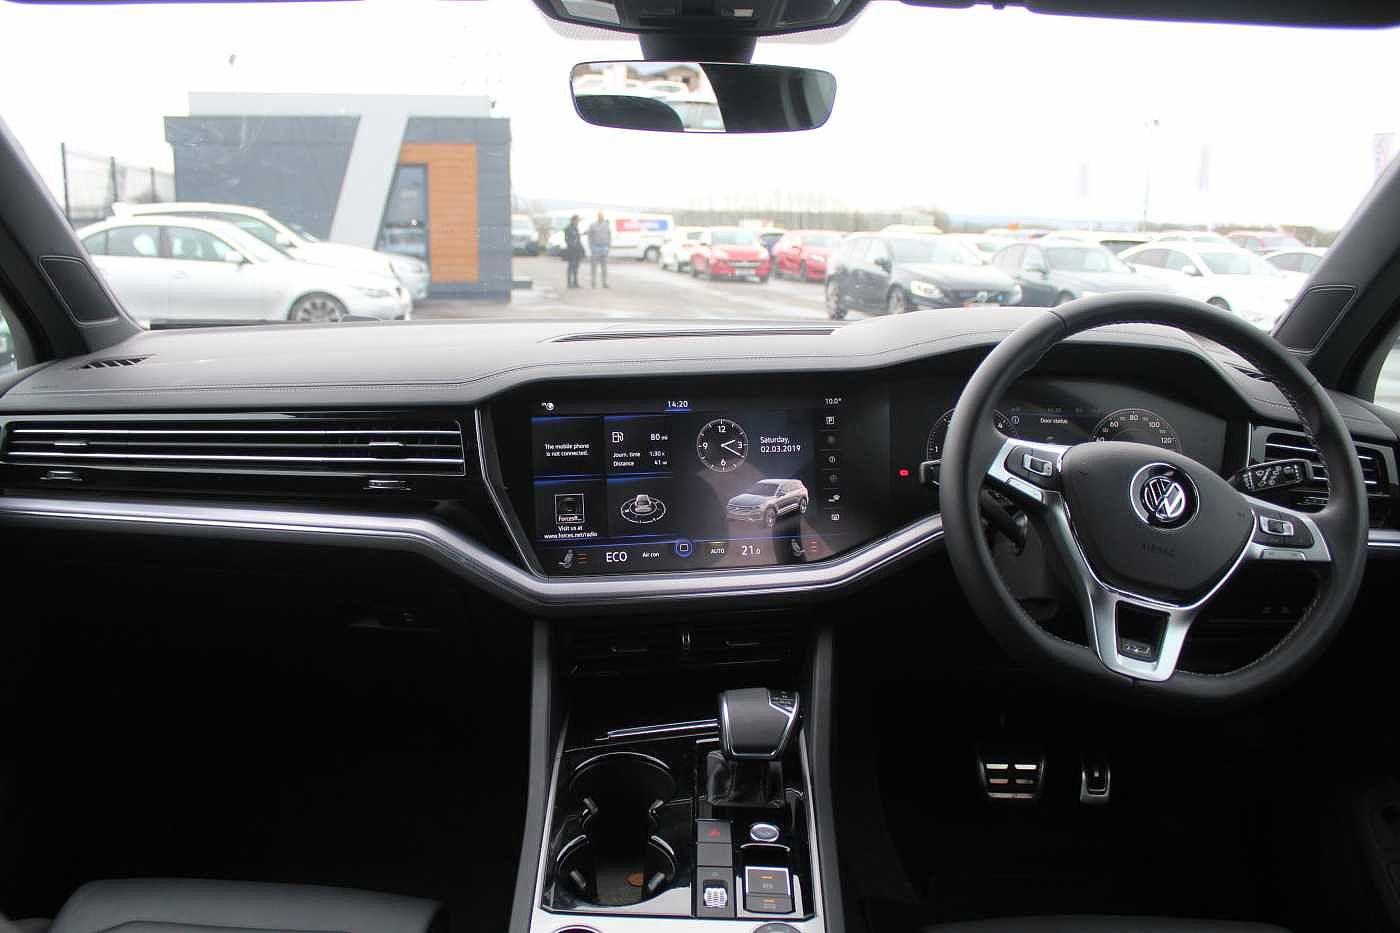 Volkswagen Touareg Images